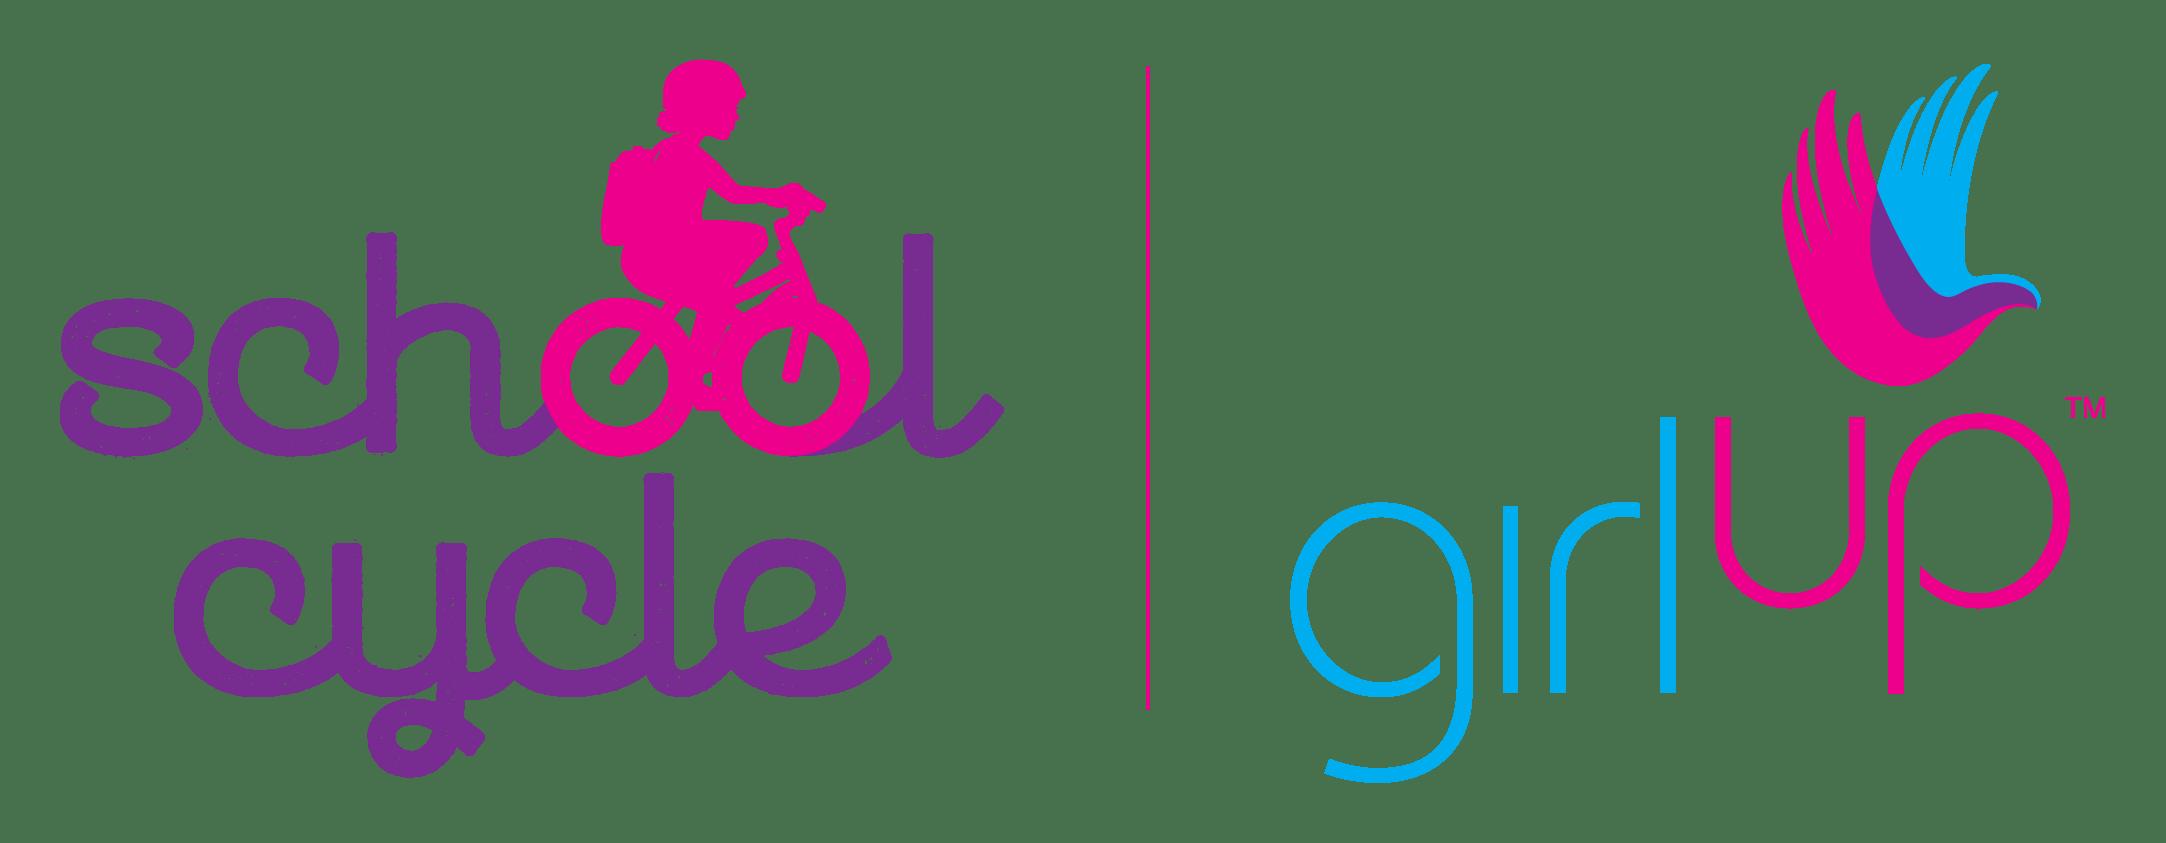 1906-School-Cycle-Logo-FNL-GirlUp-Horiz-Lockup